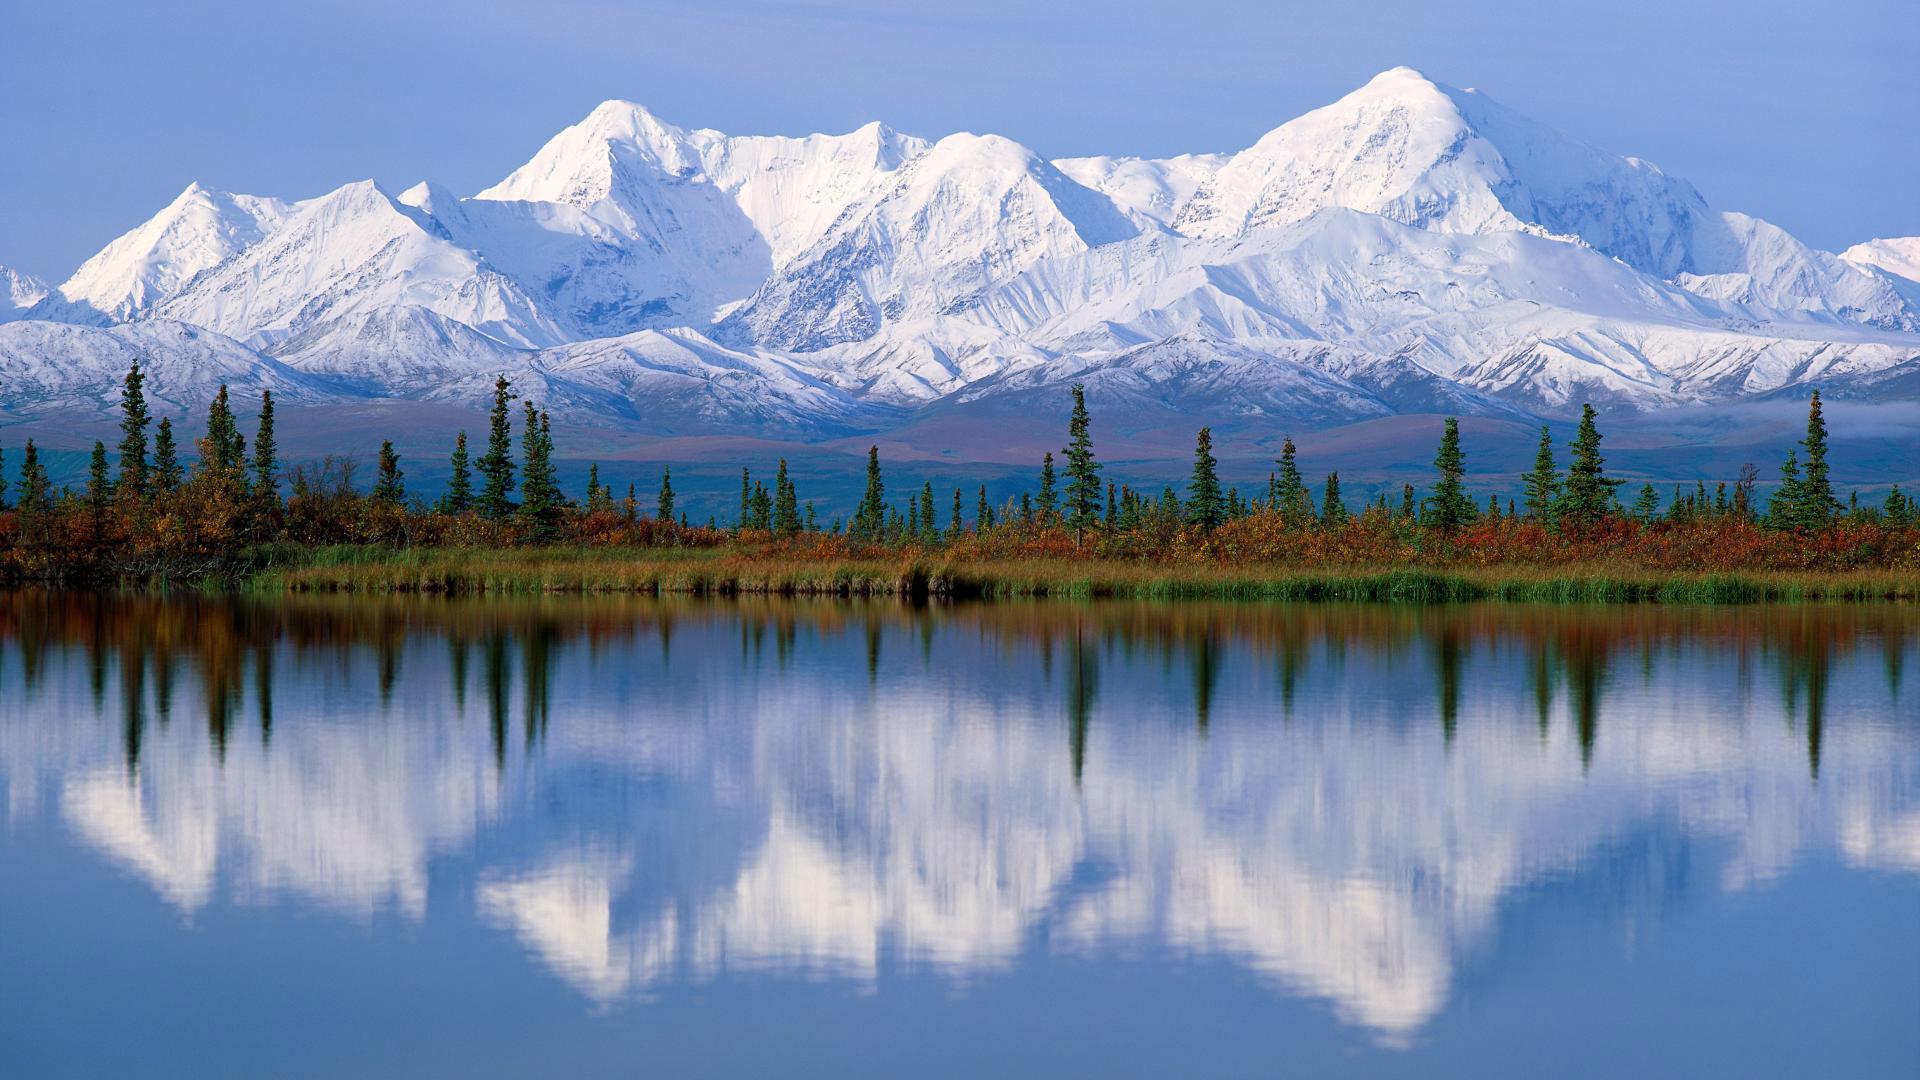 hd pics photos nature ice mountain scenery lake desktop background wallpaper